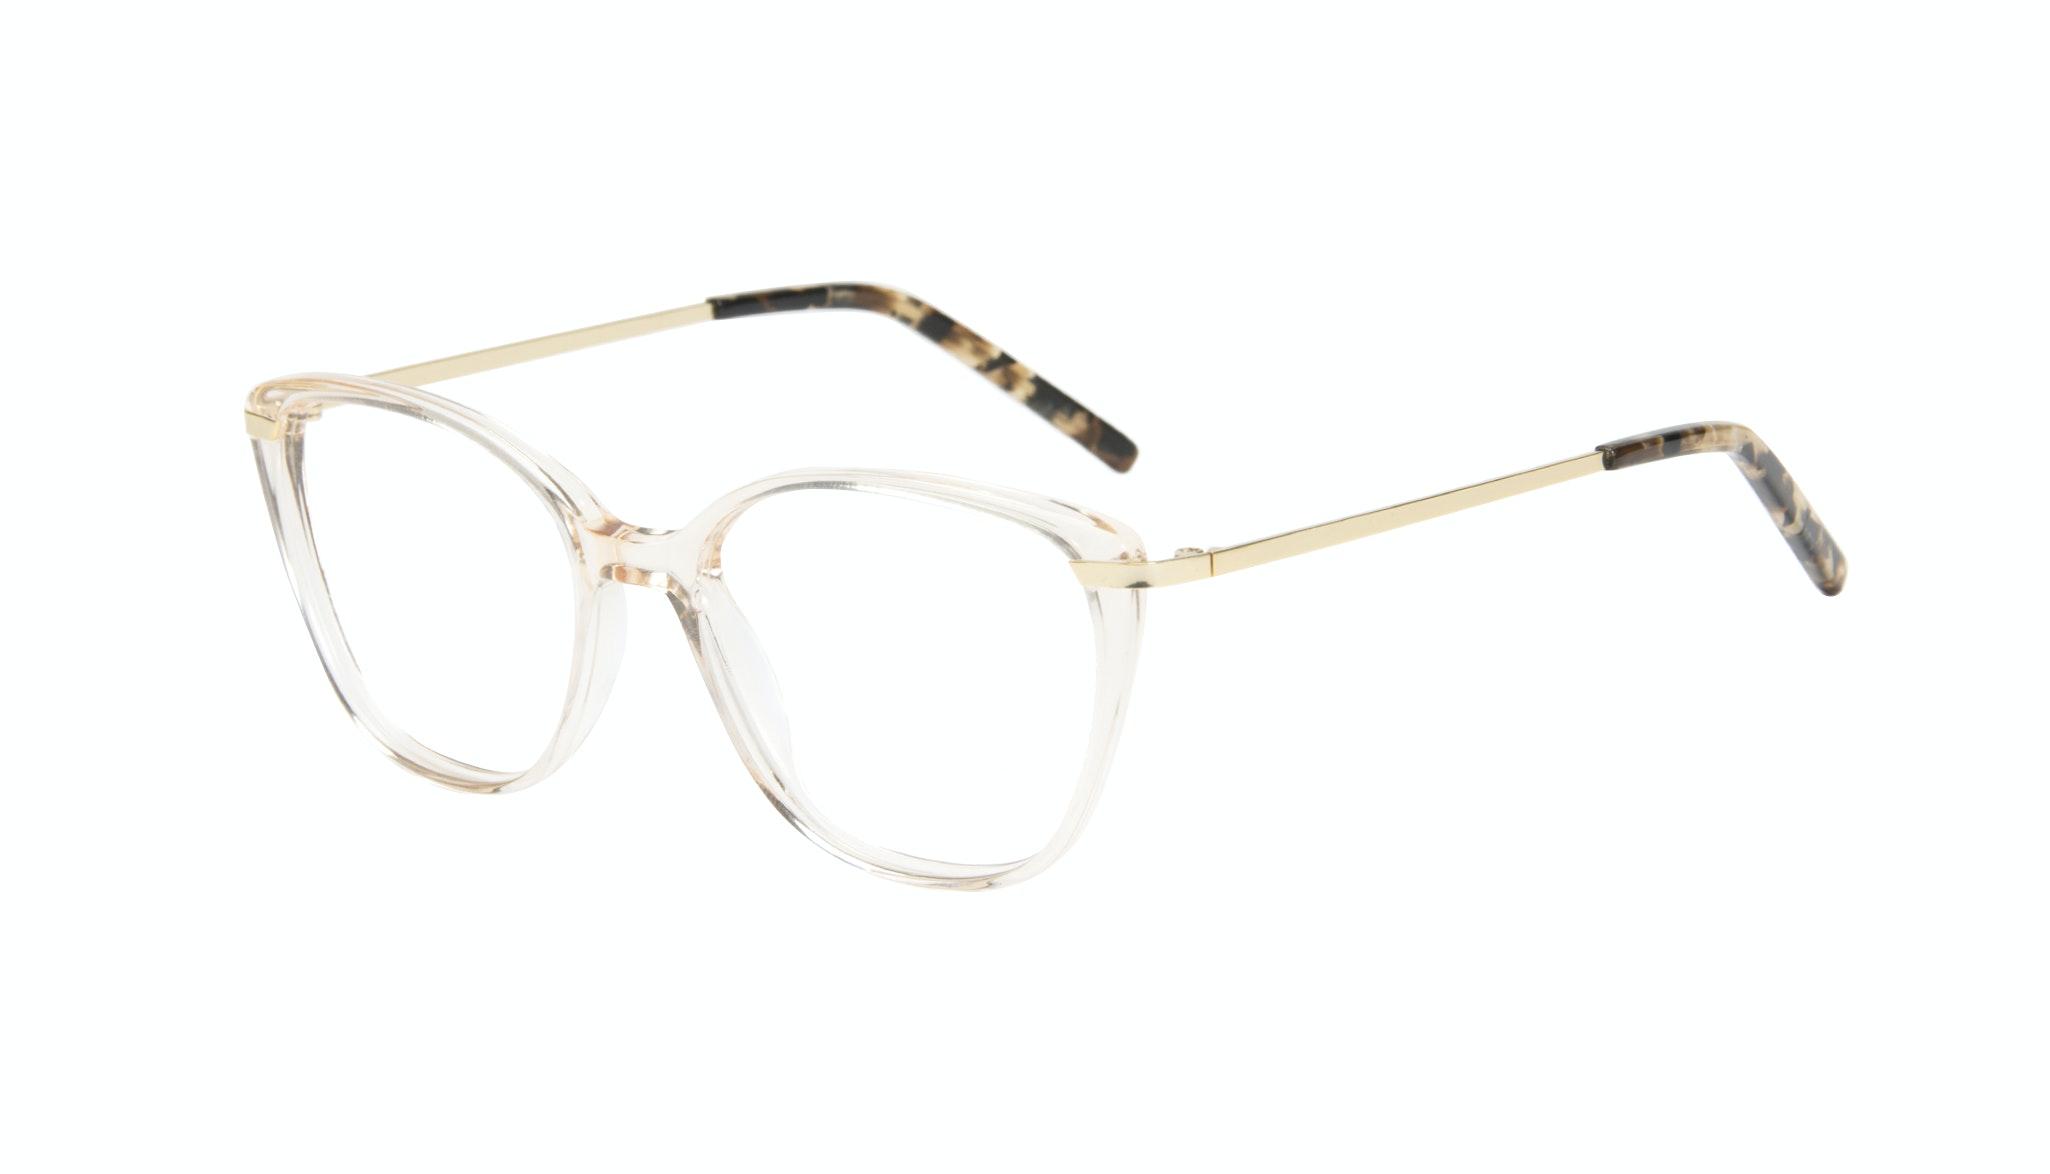 Affordable Fashion Glasses Cat Eye Rectangle Square Eyeglasses Women Illusion Blond Metal Tilt